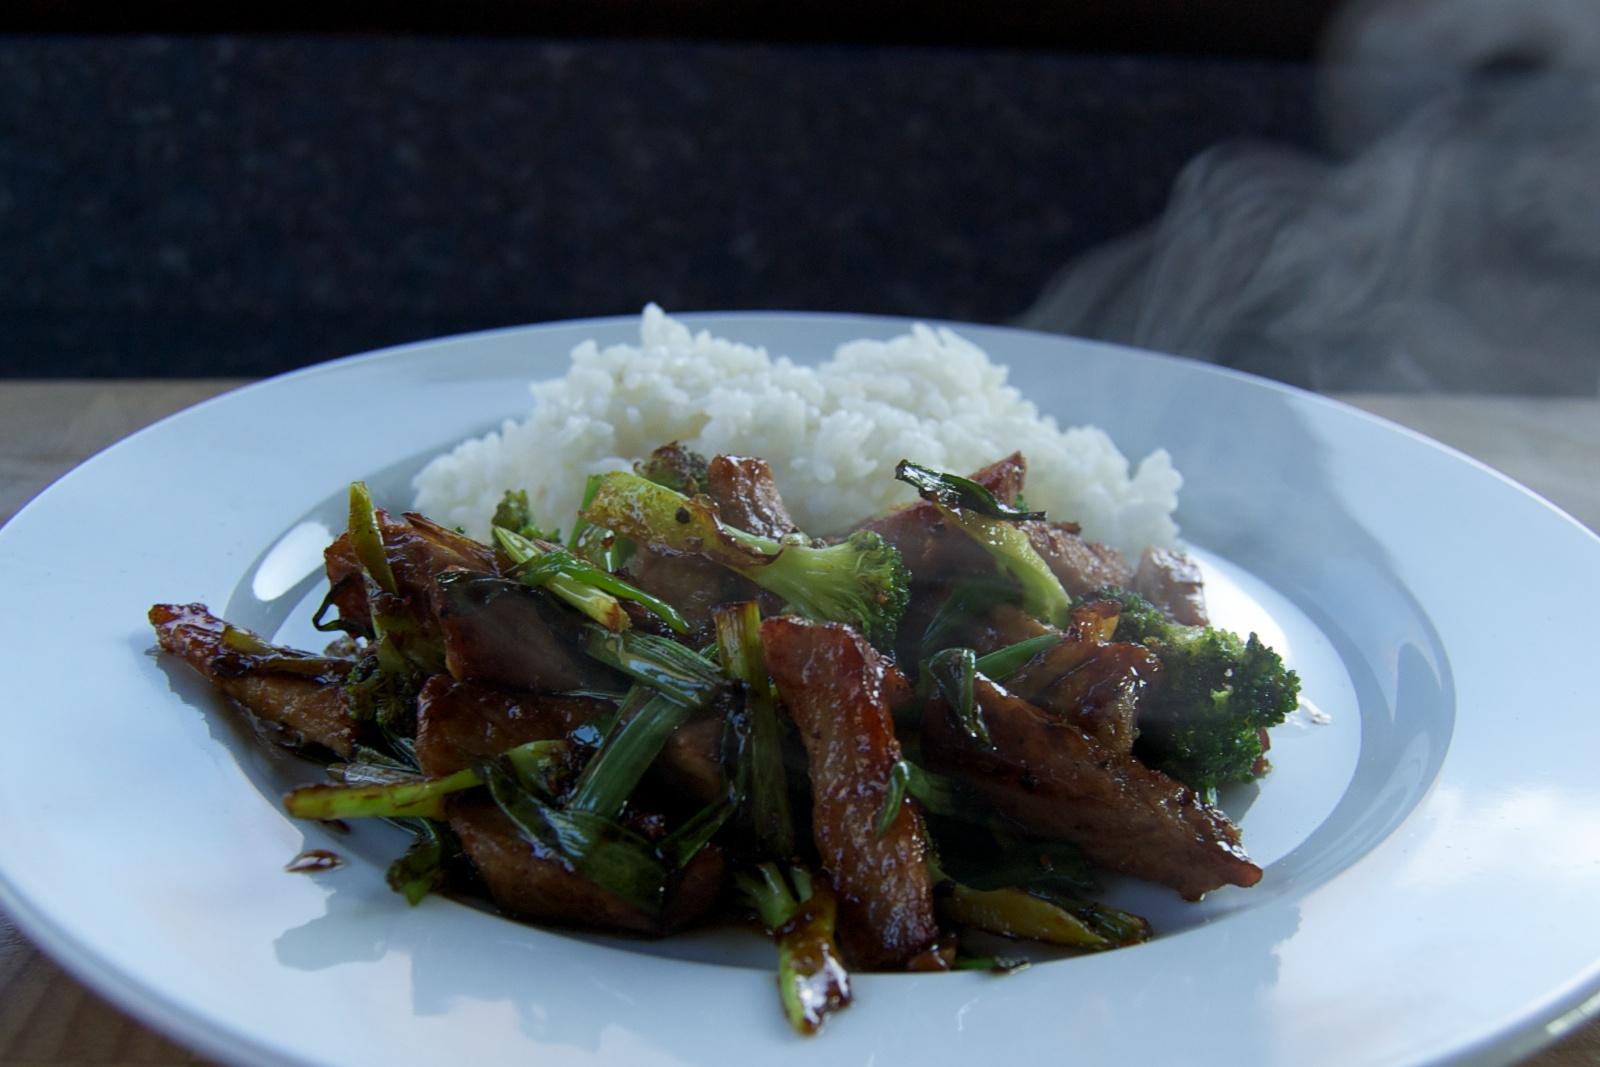 http://blog.rickk.com/food/2012/11/30/ate.2012.11.29.l.jpg